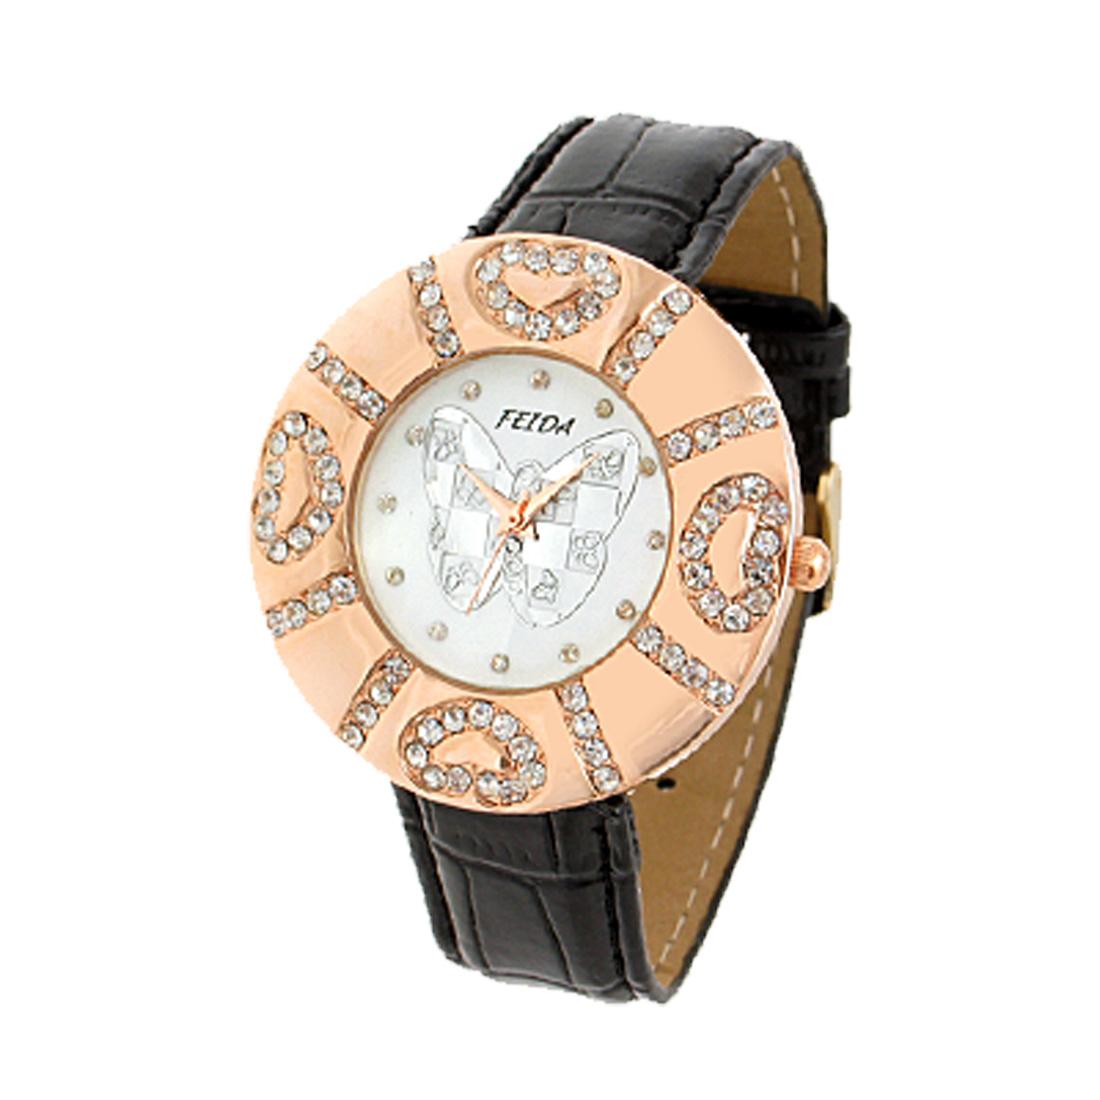 Fashion Jewelry Women Quartz Wrist Watches With Black Faux Leather Strap Round Watchcase